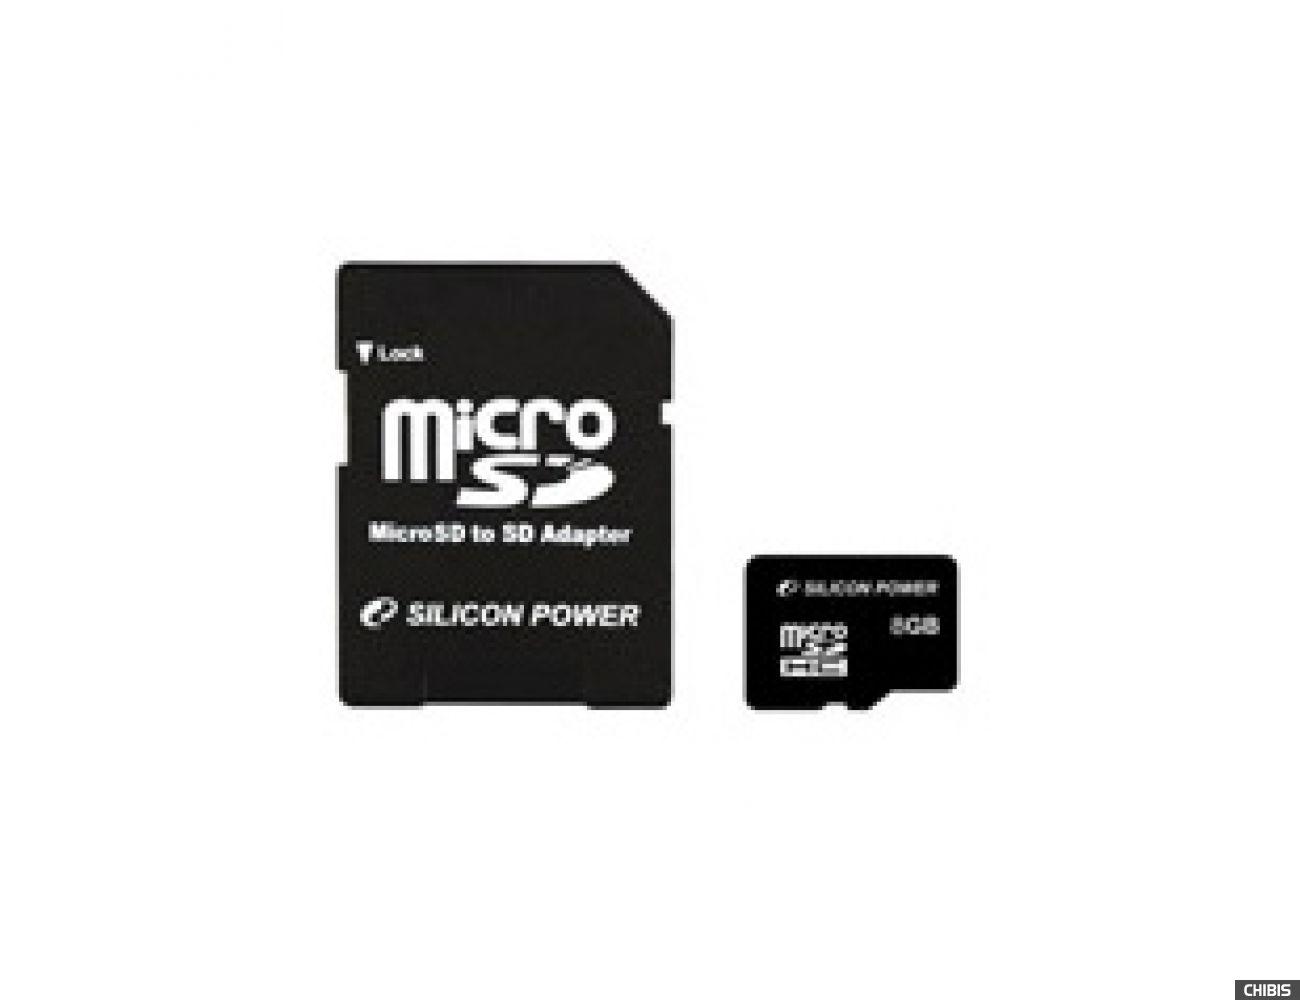 Карта памяти SILICON POWER MicroSDHC 8 GB card Class 4 + adapter